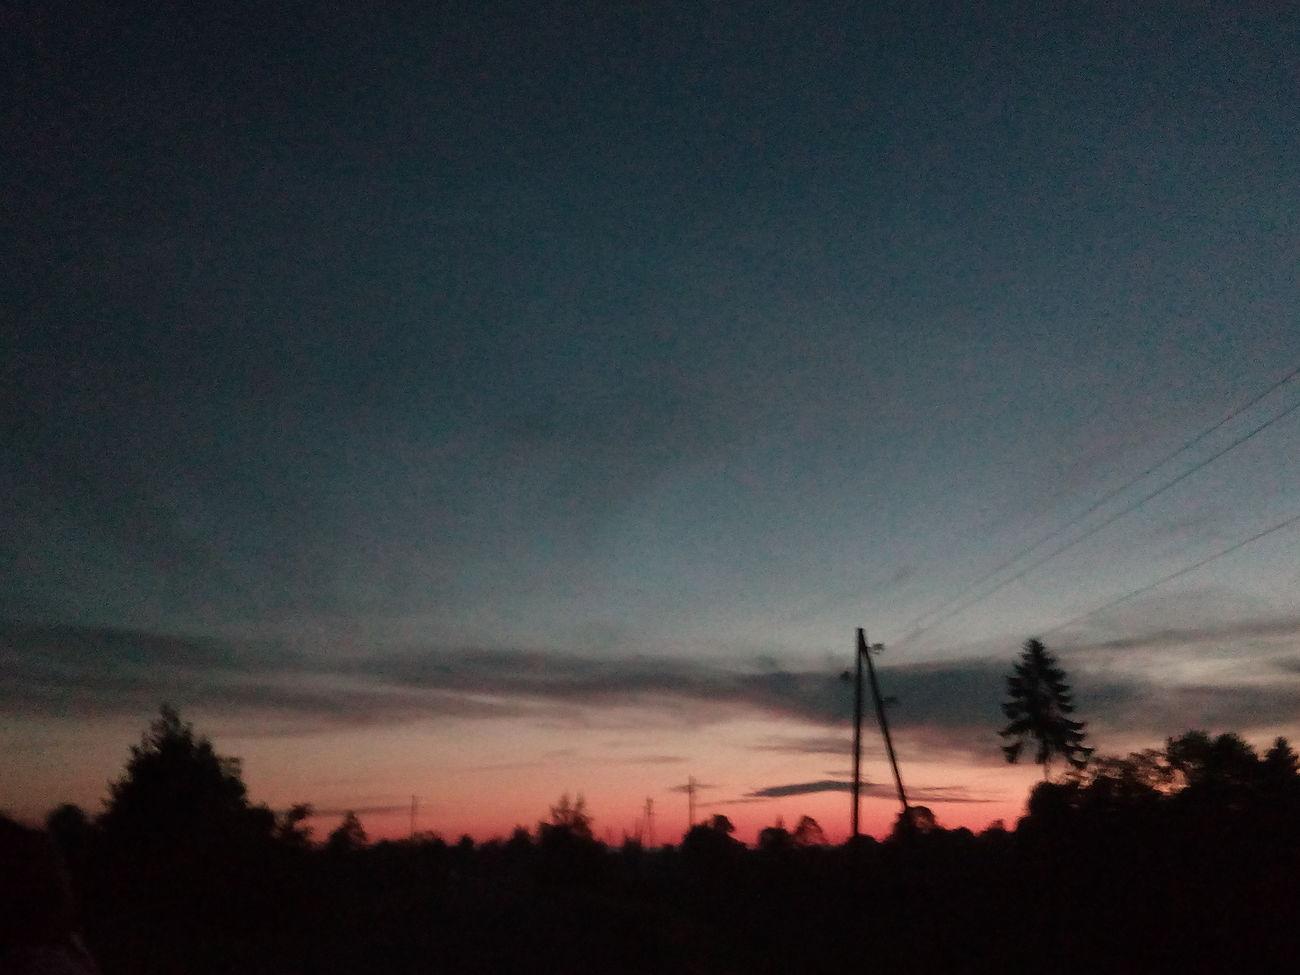 Ligo Night Sky Summer Gooddays